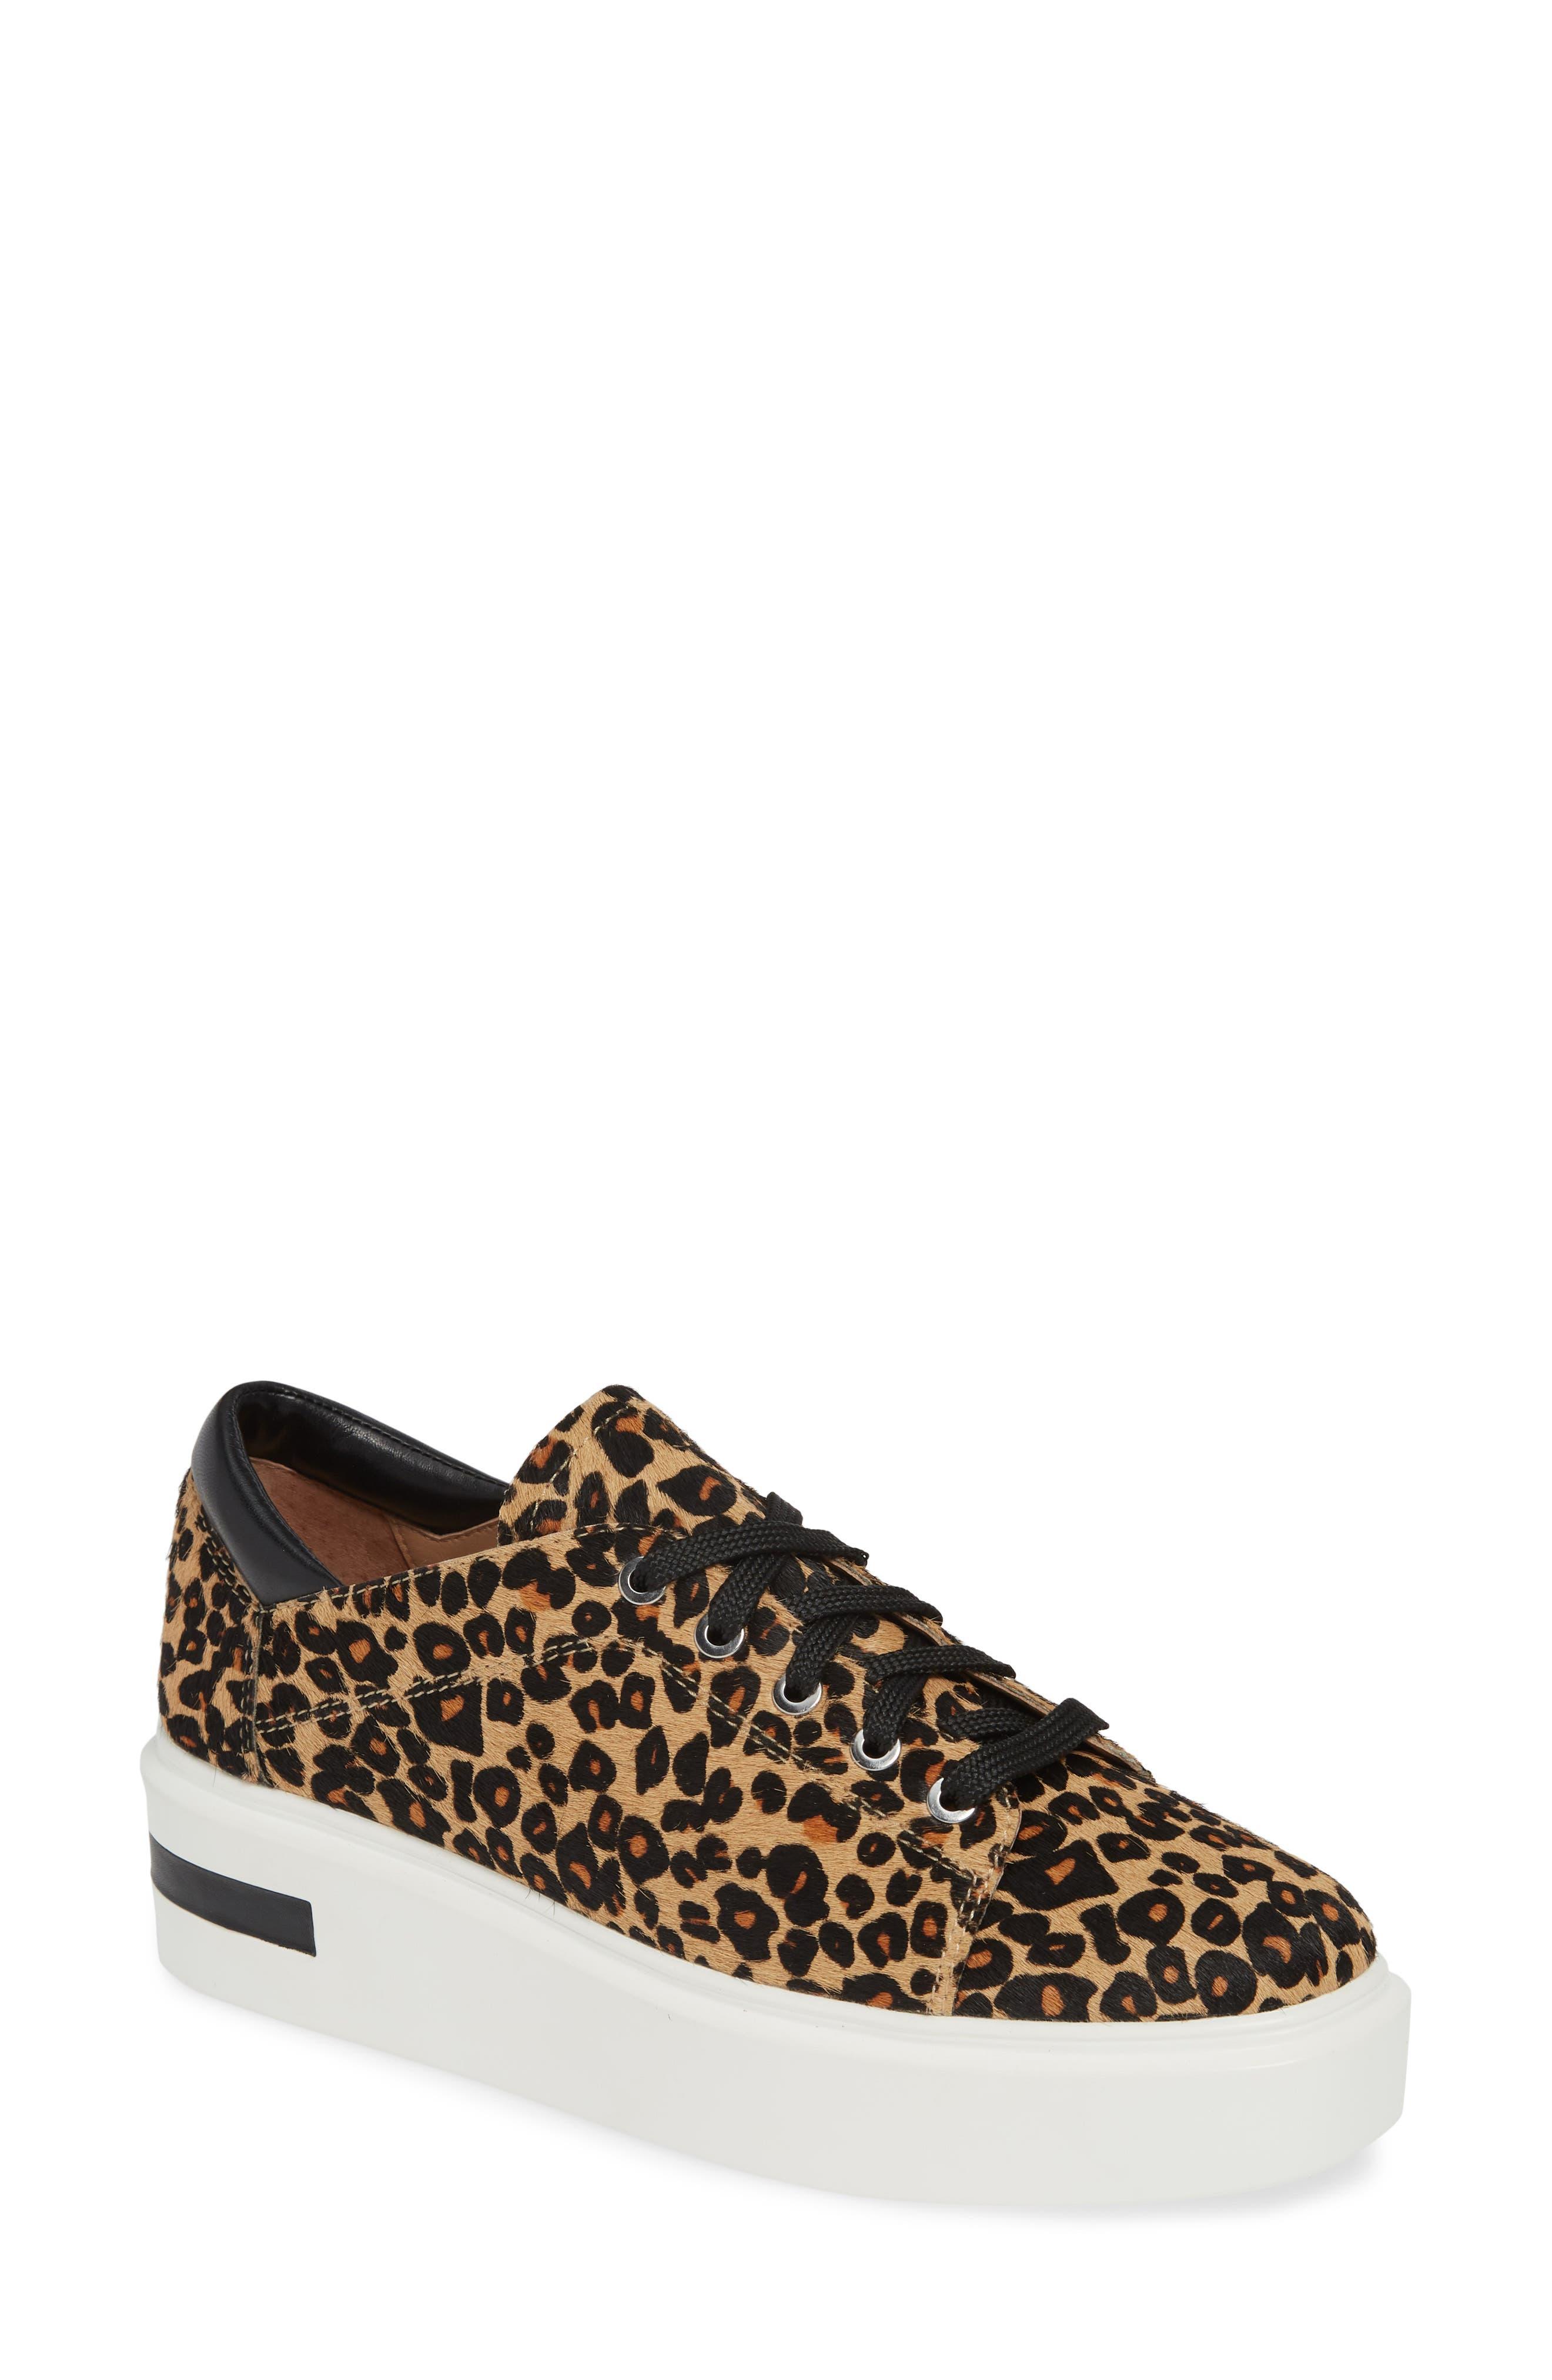 LINEA PAOLO, Kendra Genuine Calf Hair Platform Sneaker, Main thumbnail 1, color, LEOPARD PRINT CALF HAIR